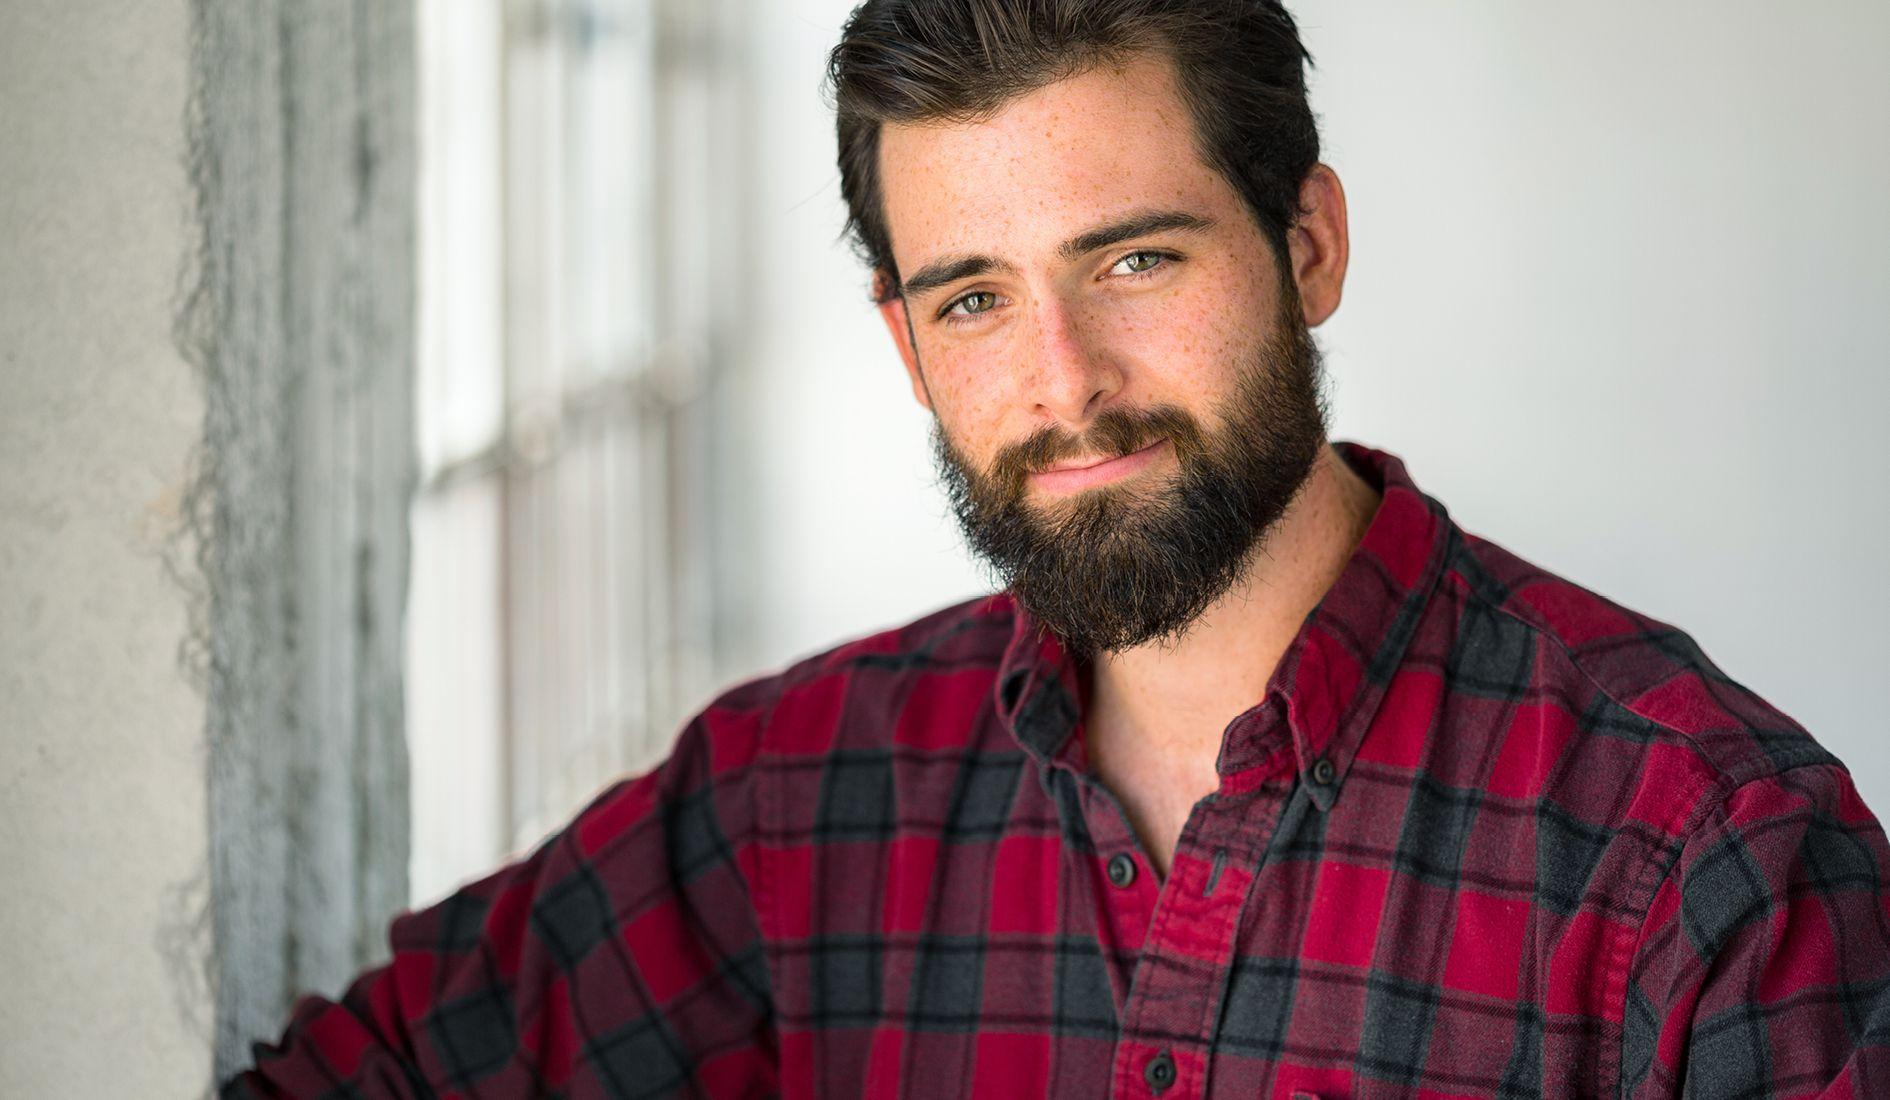 How to fix a patchy beard patchy beard beard wash